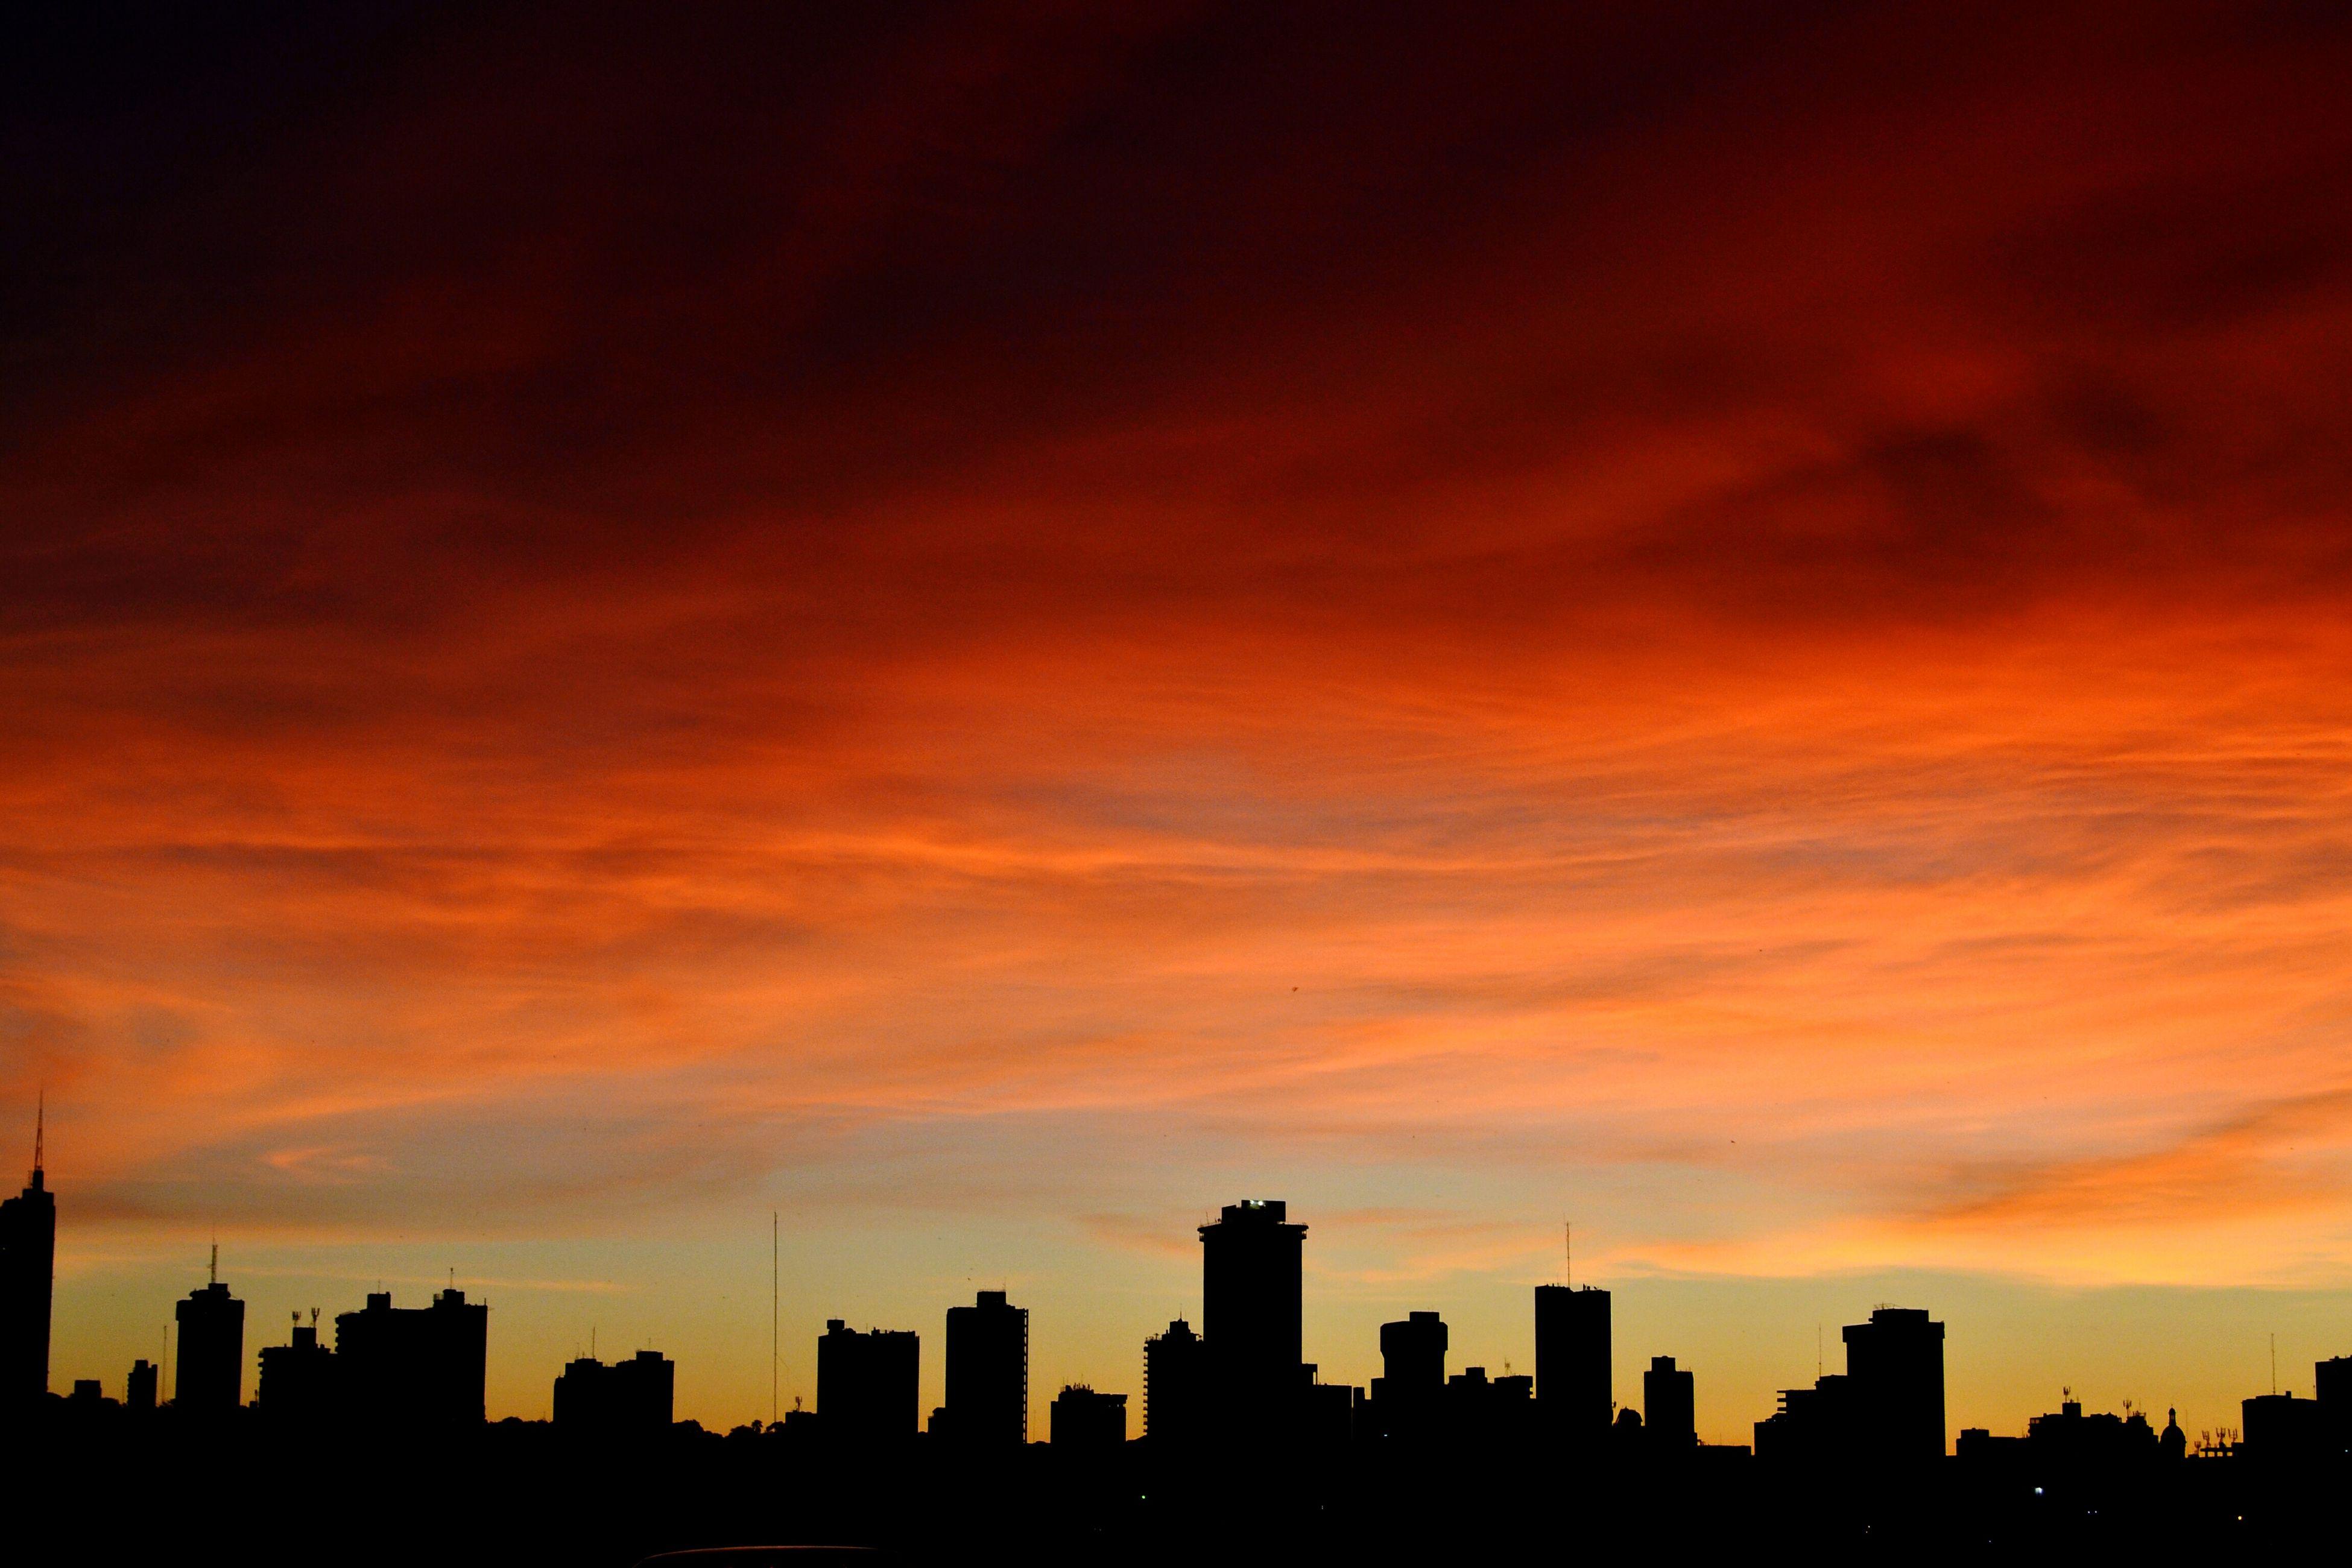 Asunción Cityscape City Urban Skyline Sunset Sky Horizontal Orange Color asuncion Paraguay Paraguayenfotos Paraguayasuncion Bless Joy Family Time Warm Warm Colors